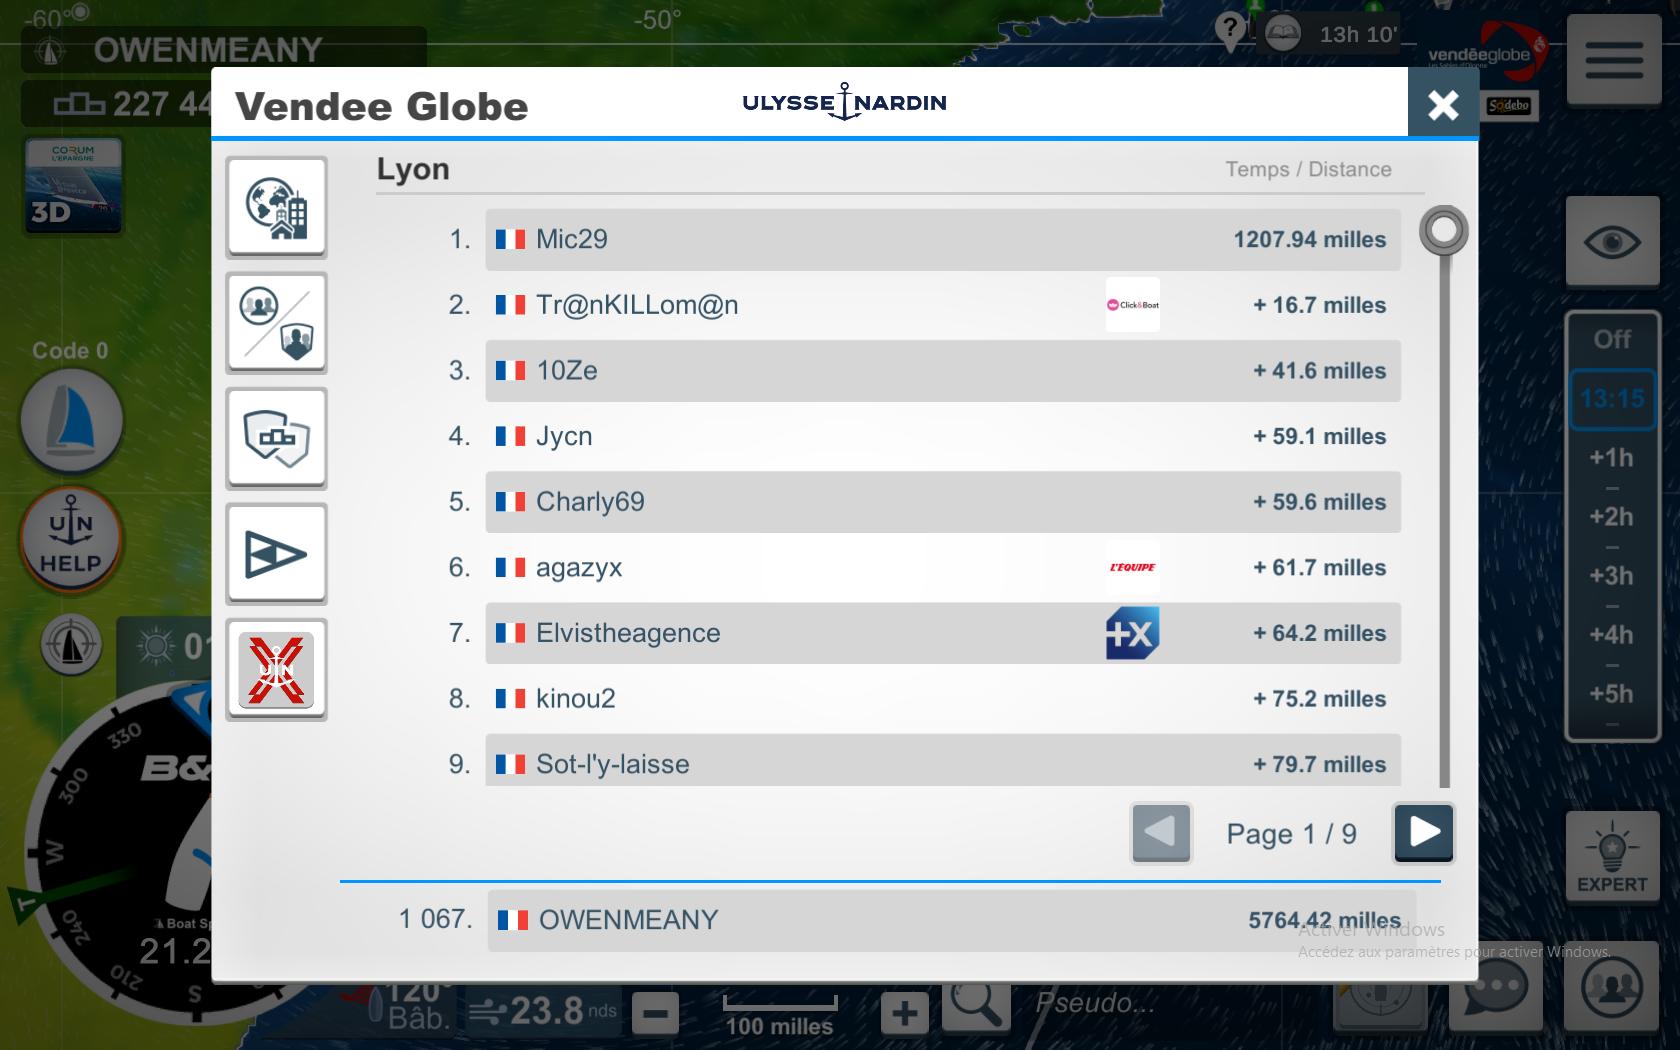 Vendée Globe virtuel: Virtual Regatta, édition 2020 - Page 2 Captu548